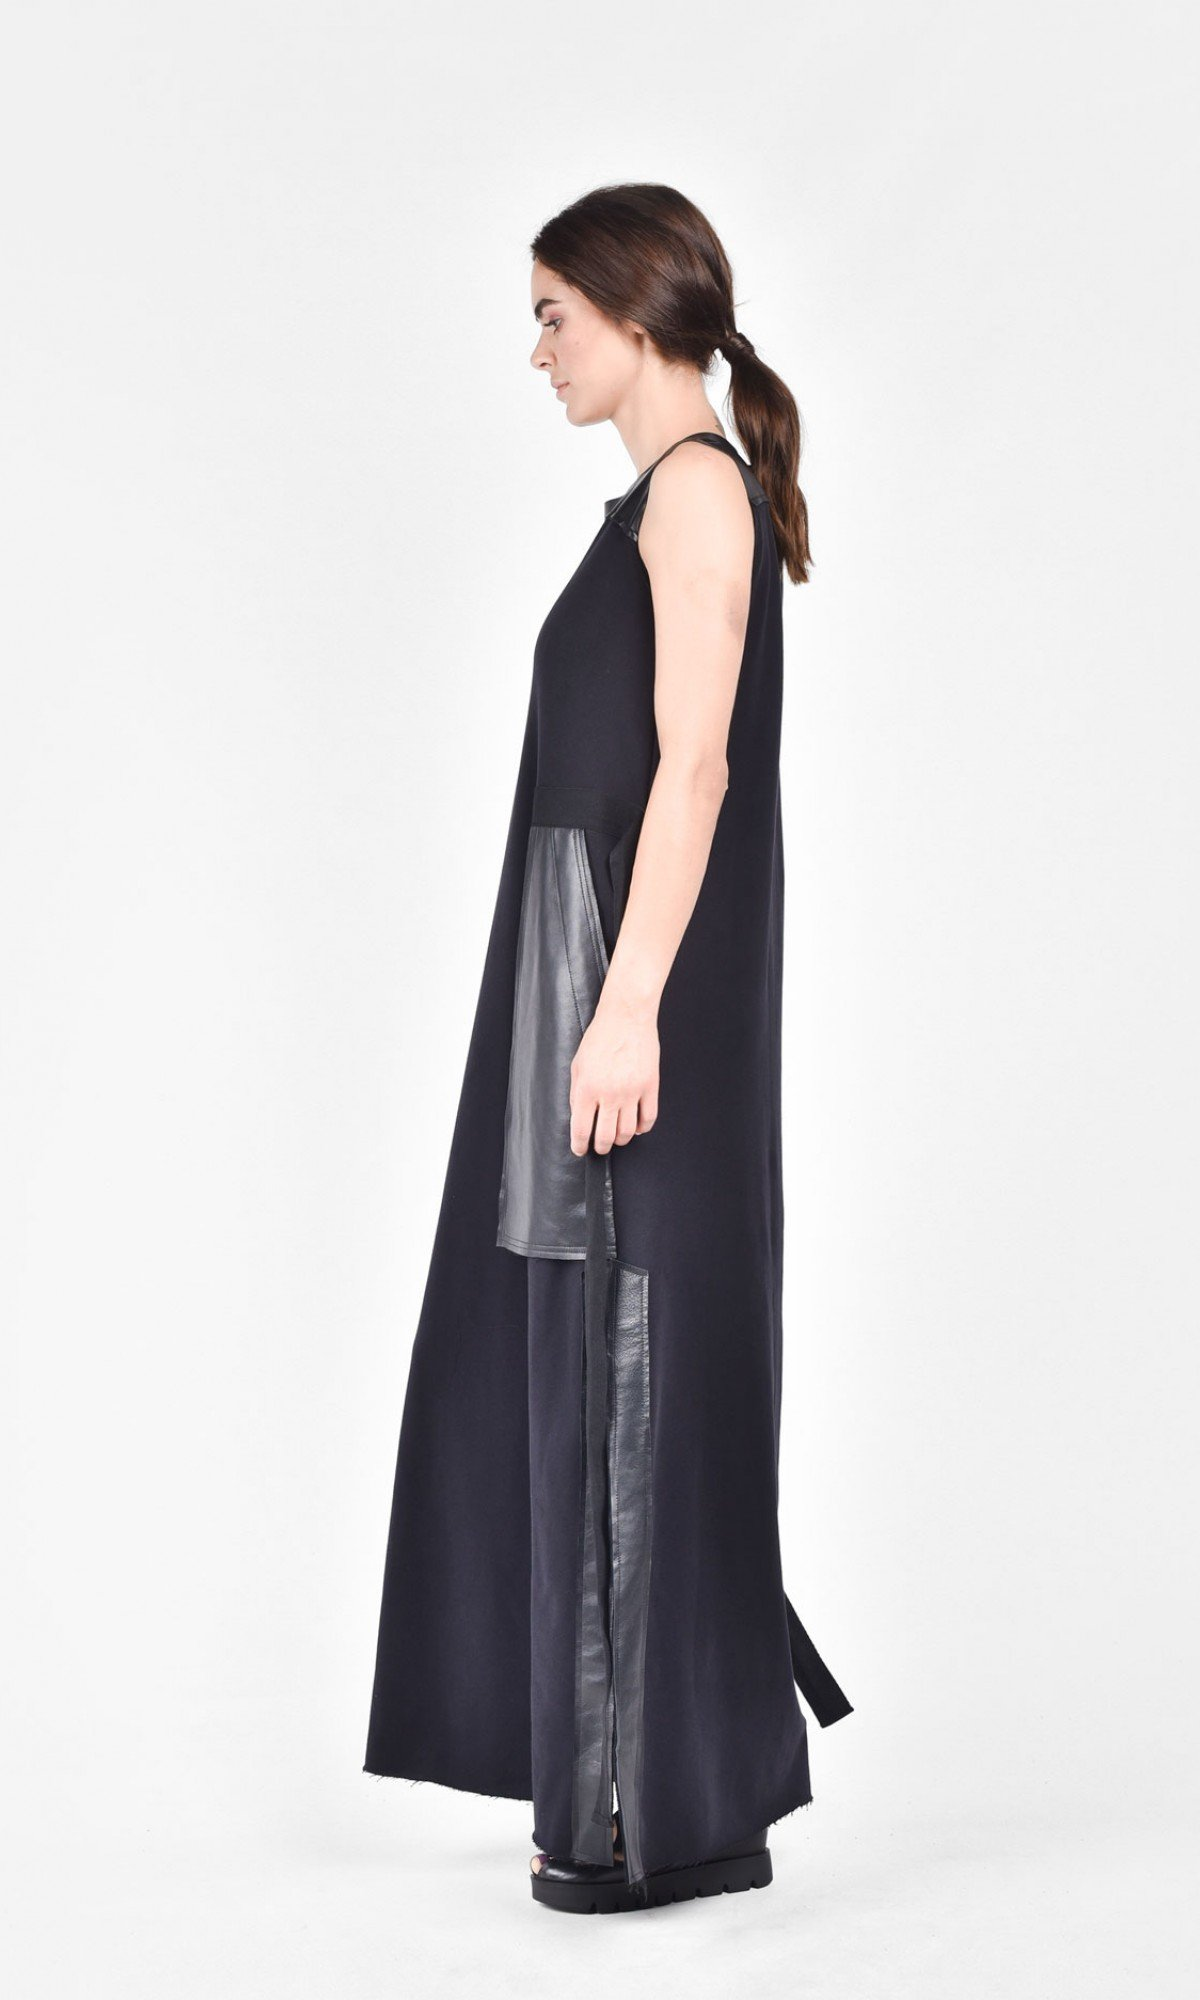 Black Leather Side Pockets Dress A03374